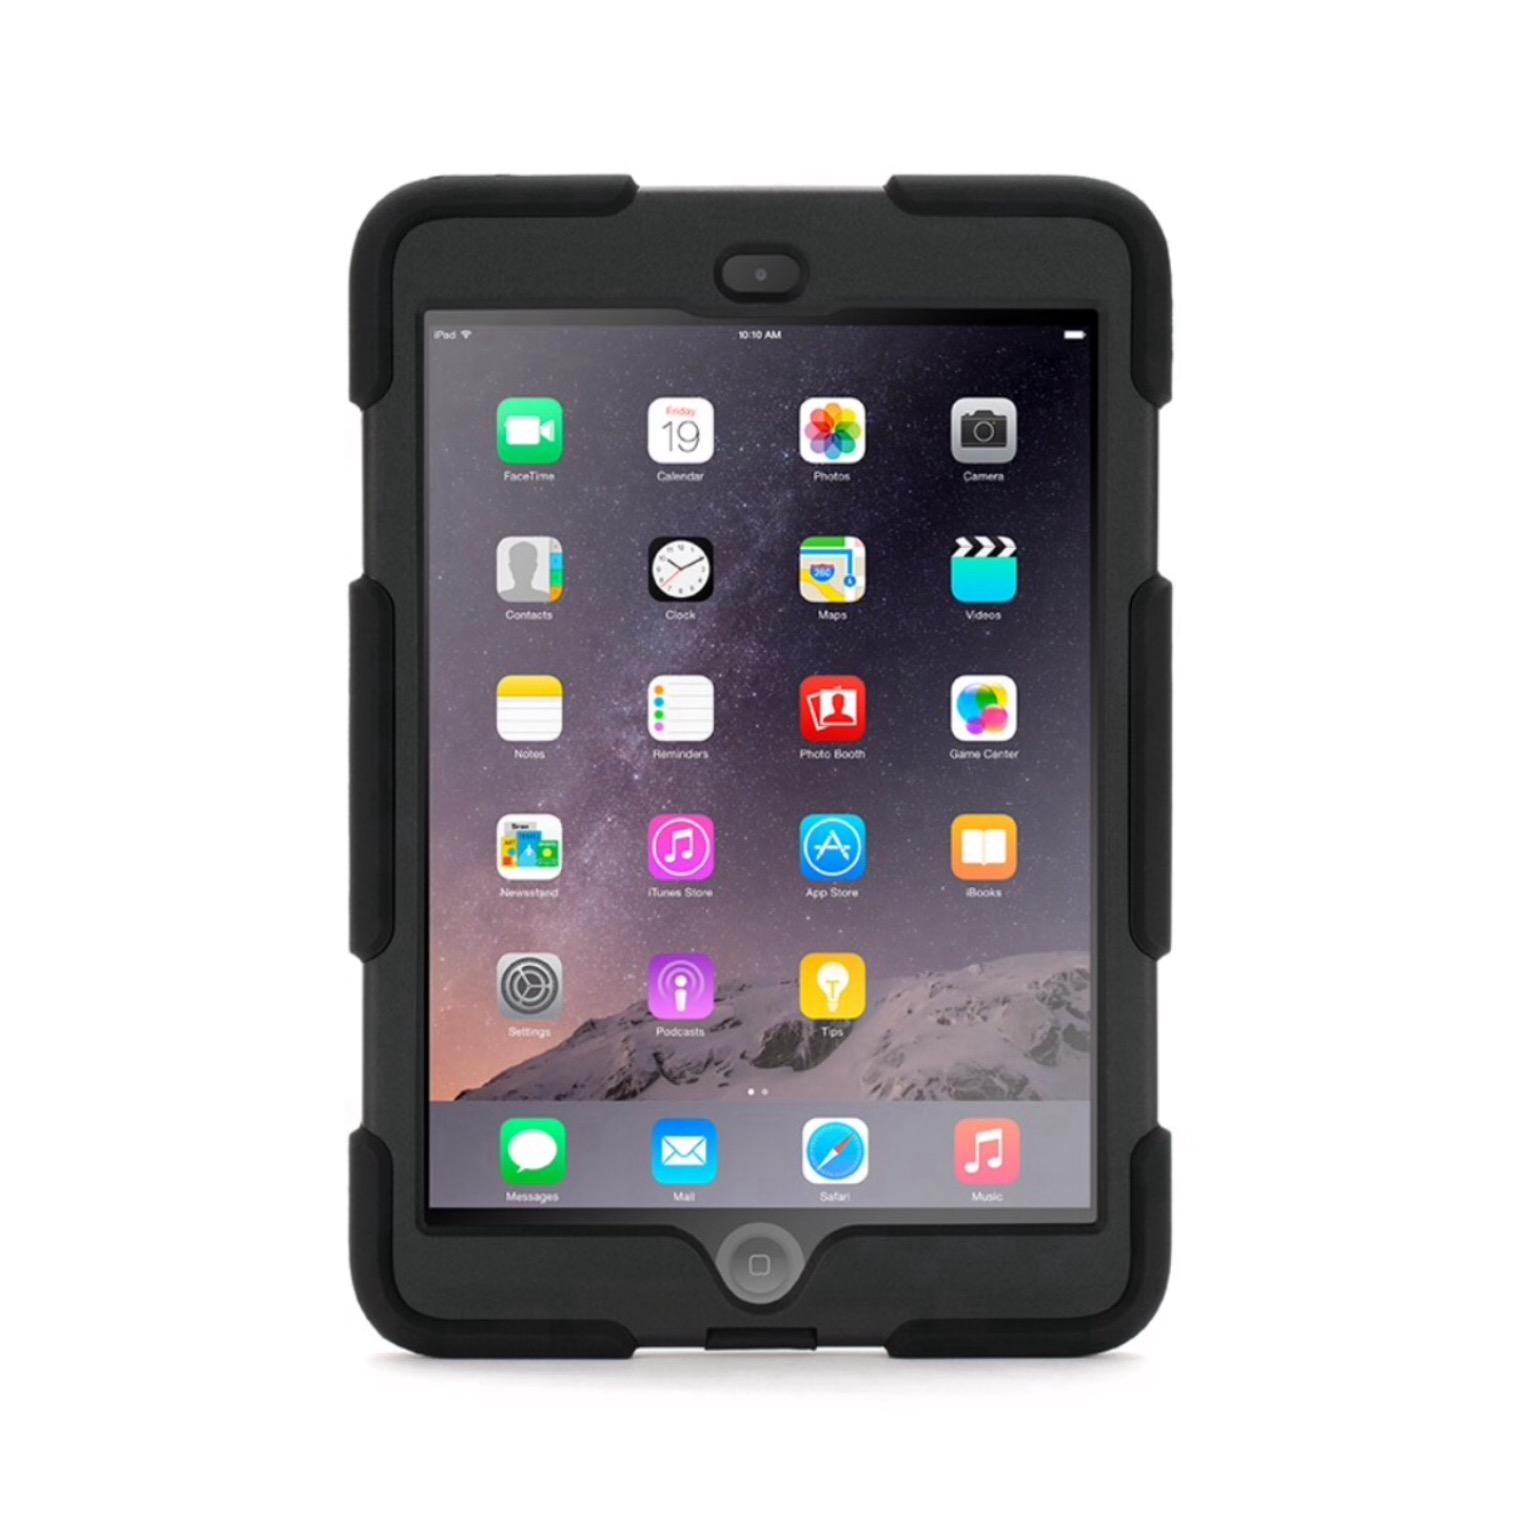 coque ipad mini 4 renforcee avec pied amovible survivor apple etuis coques ipad mini 4